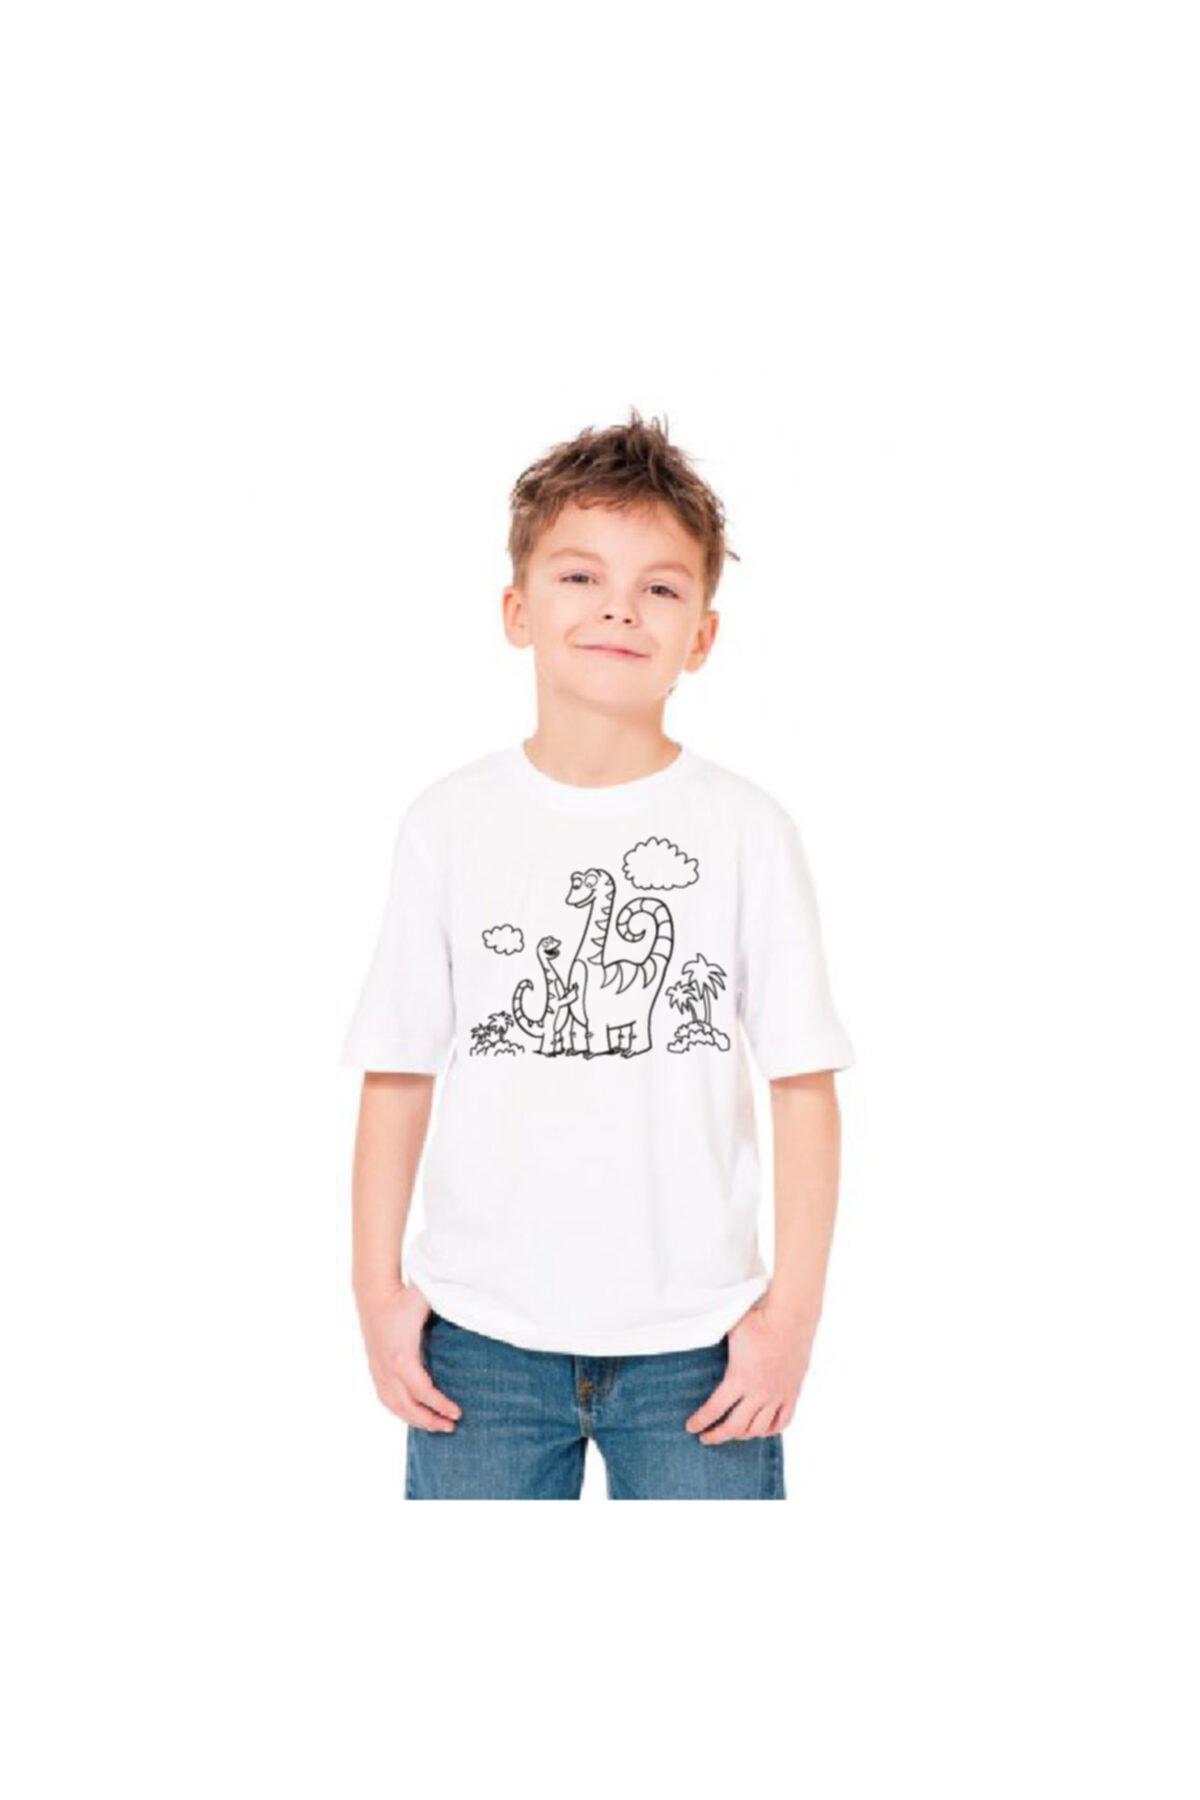 paint-wear Dinazor Ailesi Boyama T-shirt 9-11 Yaş 2